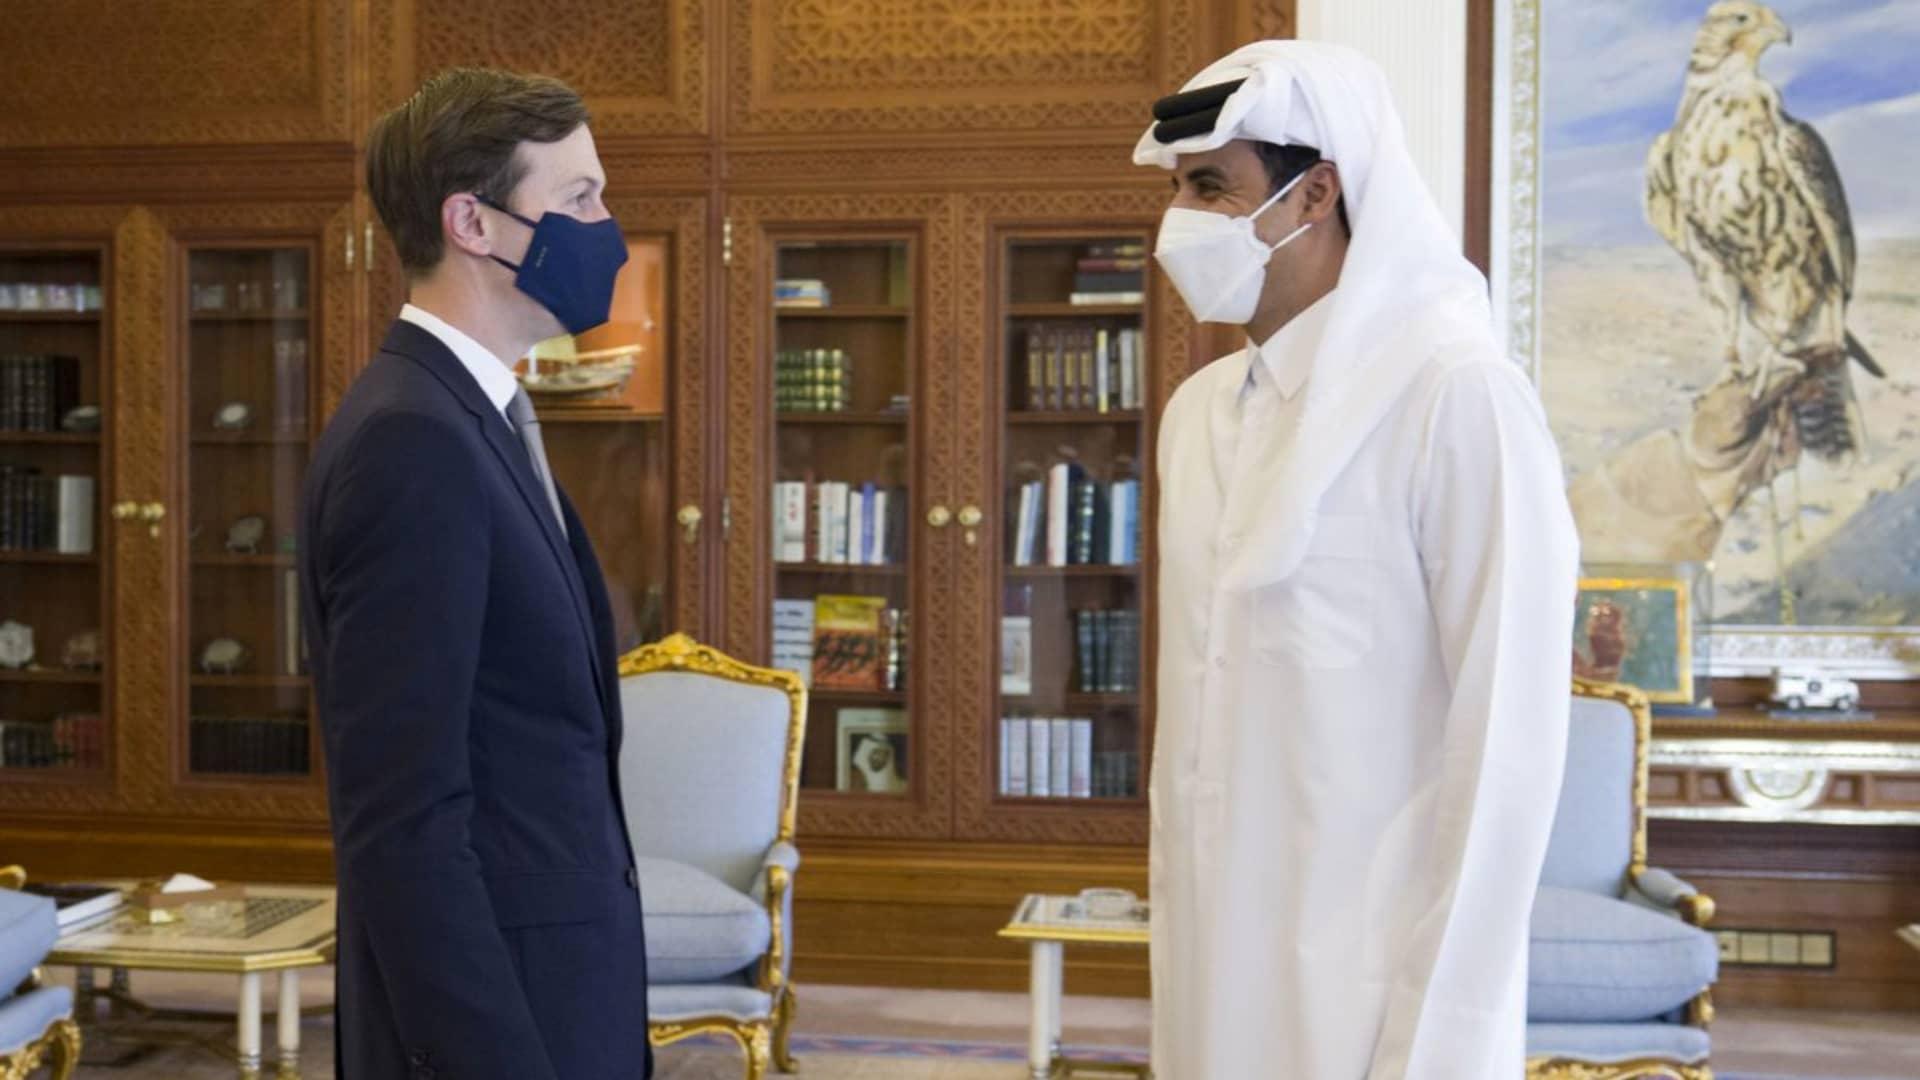 Qatar's ruler, Emir Sheikh Tamim bin Hamad al-Thani, meets with U.S. President's senior adviser Jared Kushner in Doha, Qatar, December 2, 2020.